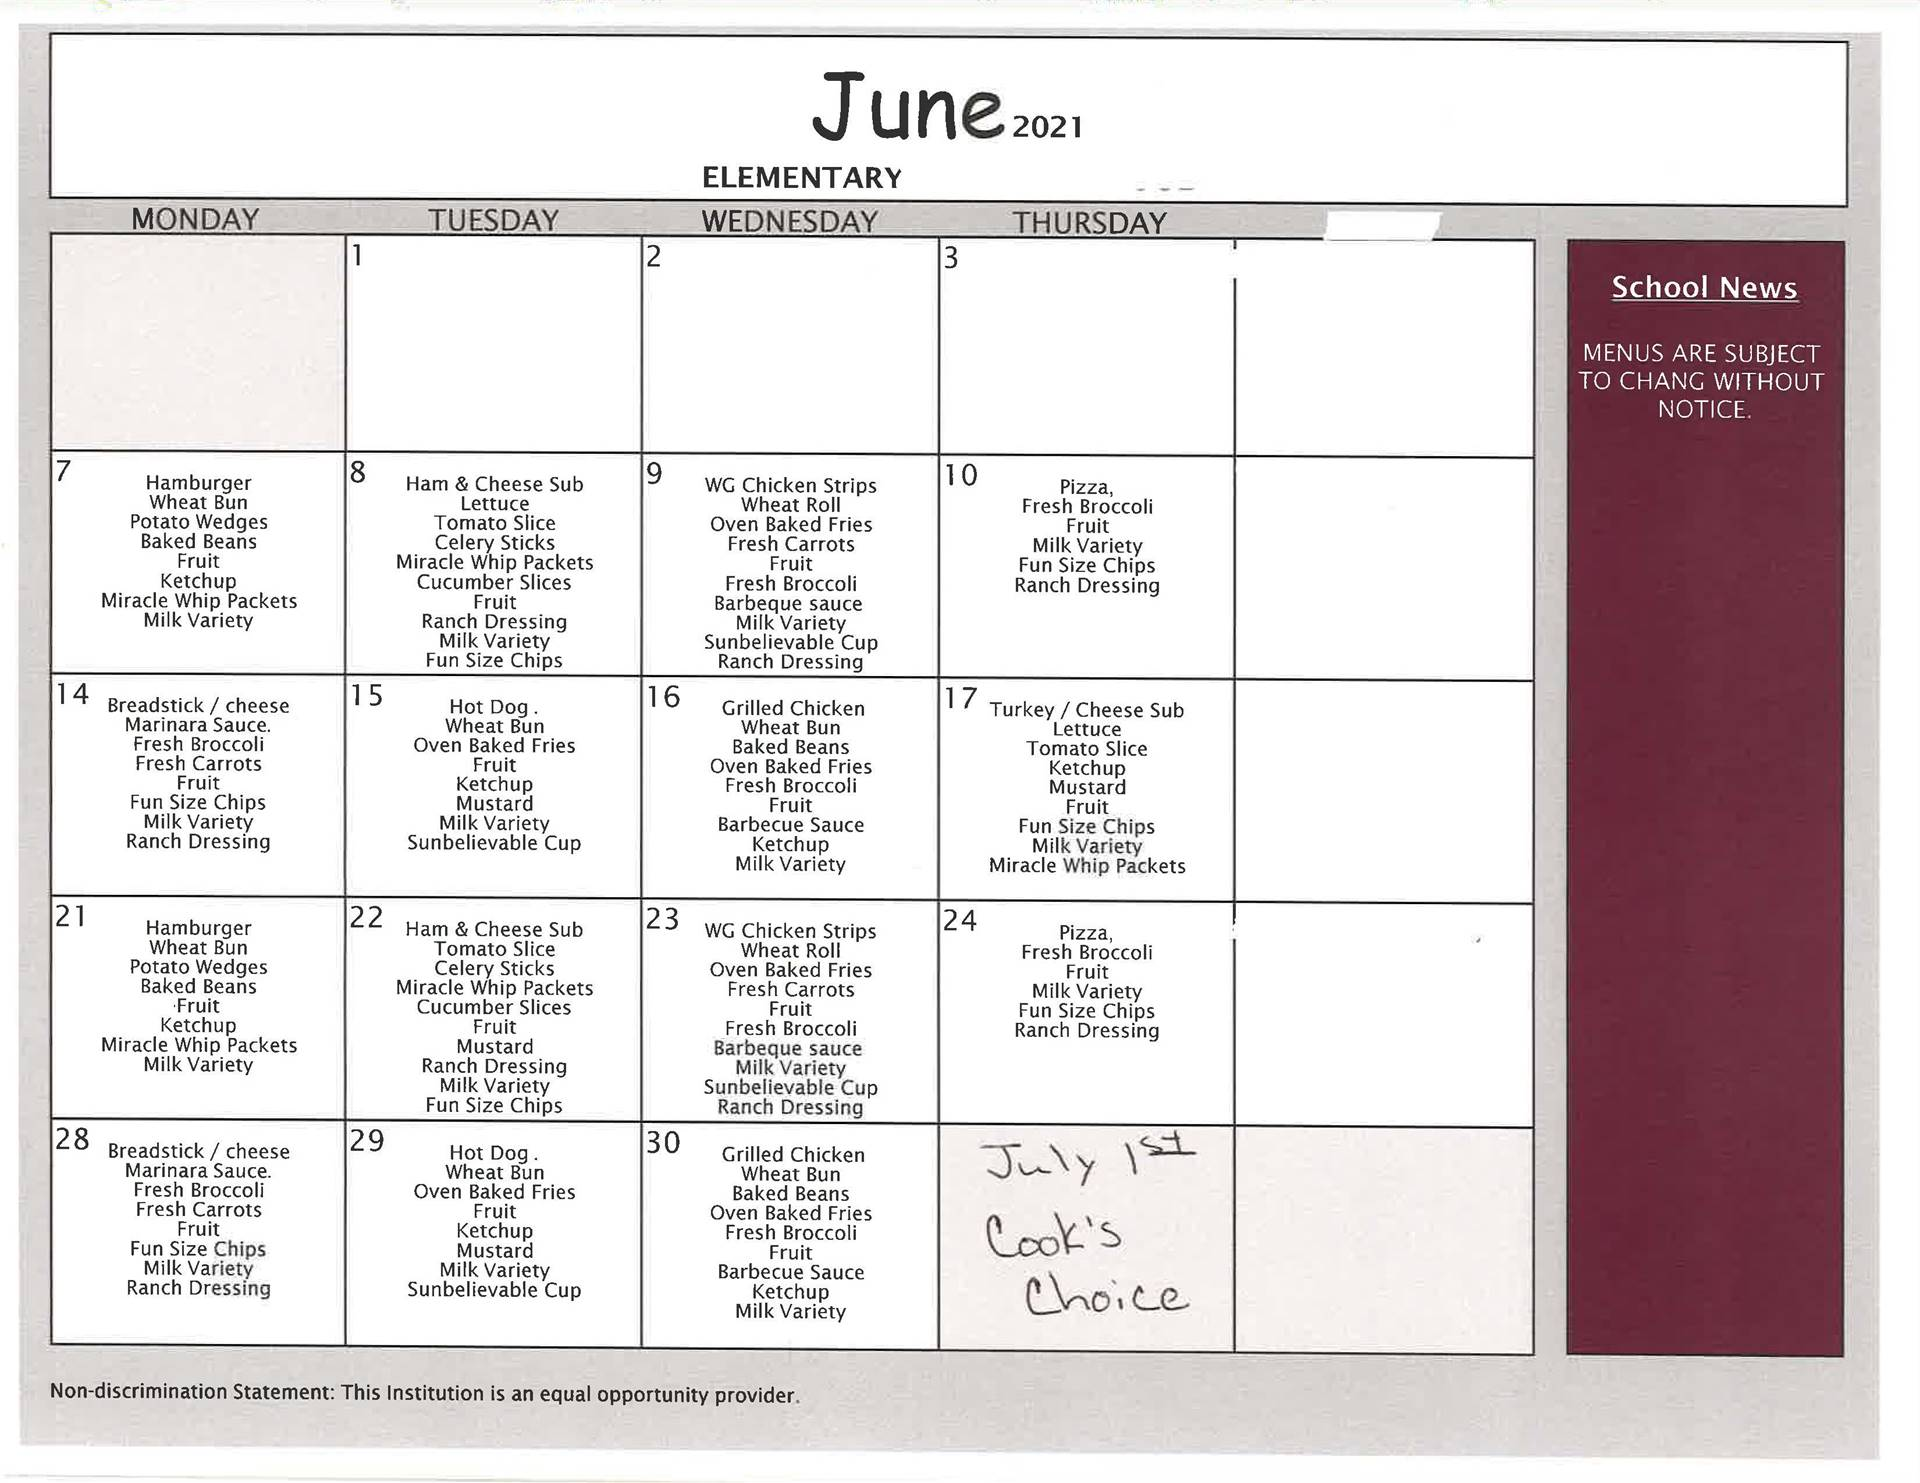 June Elementary Lunch - Summer School/Summer Feeding Program